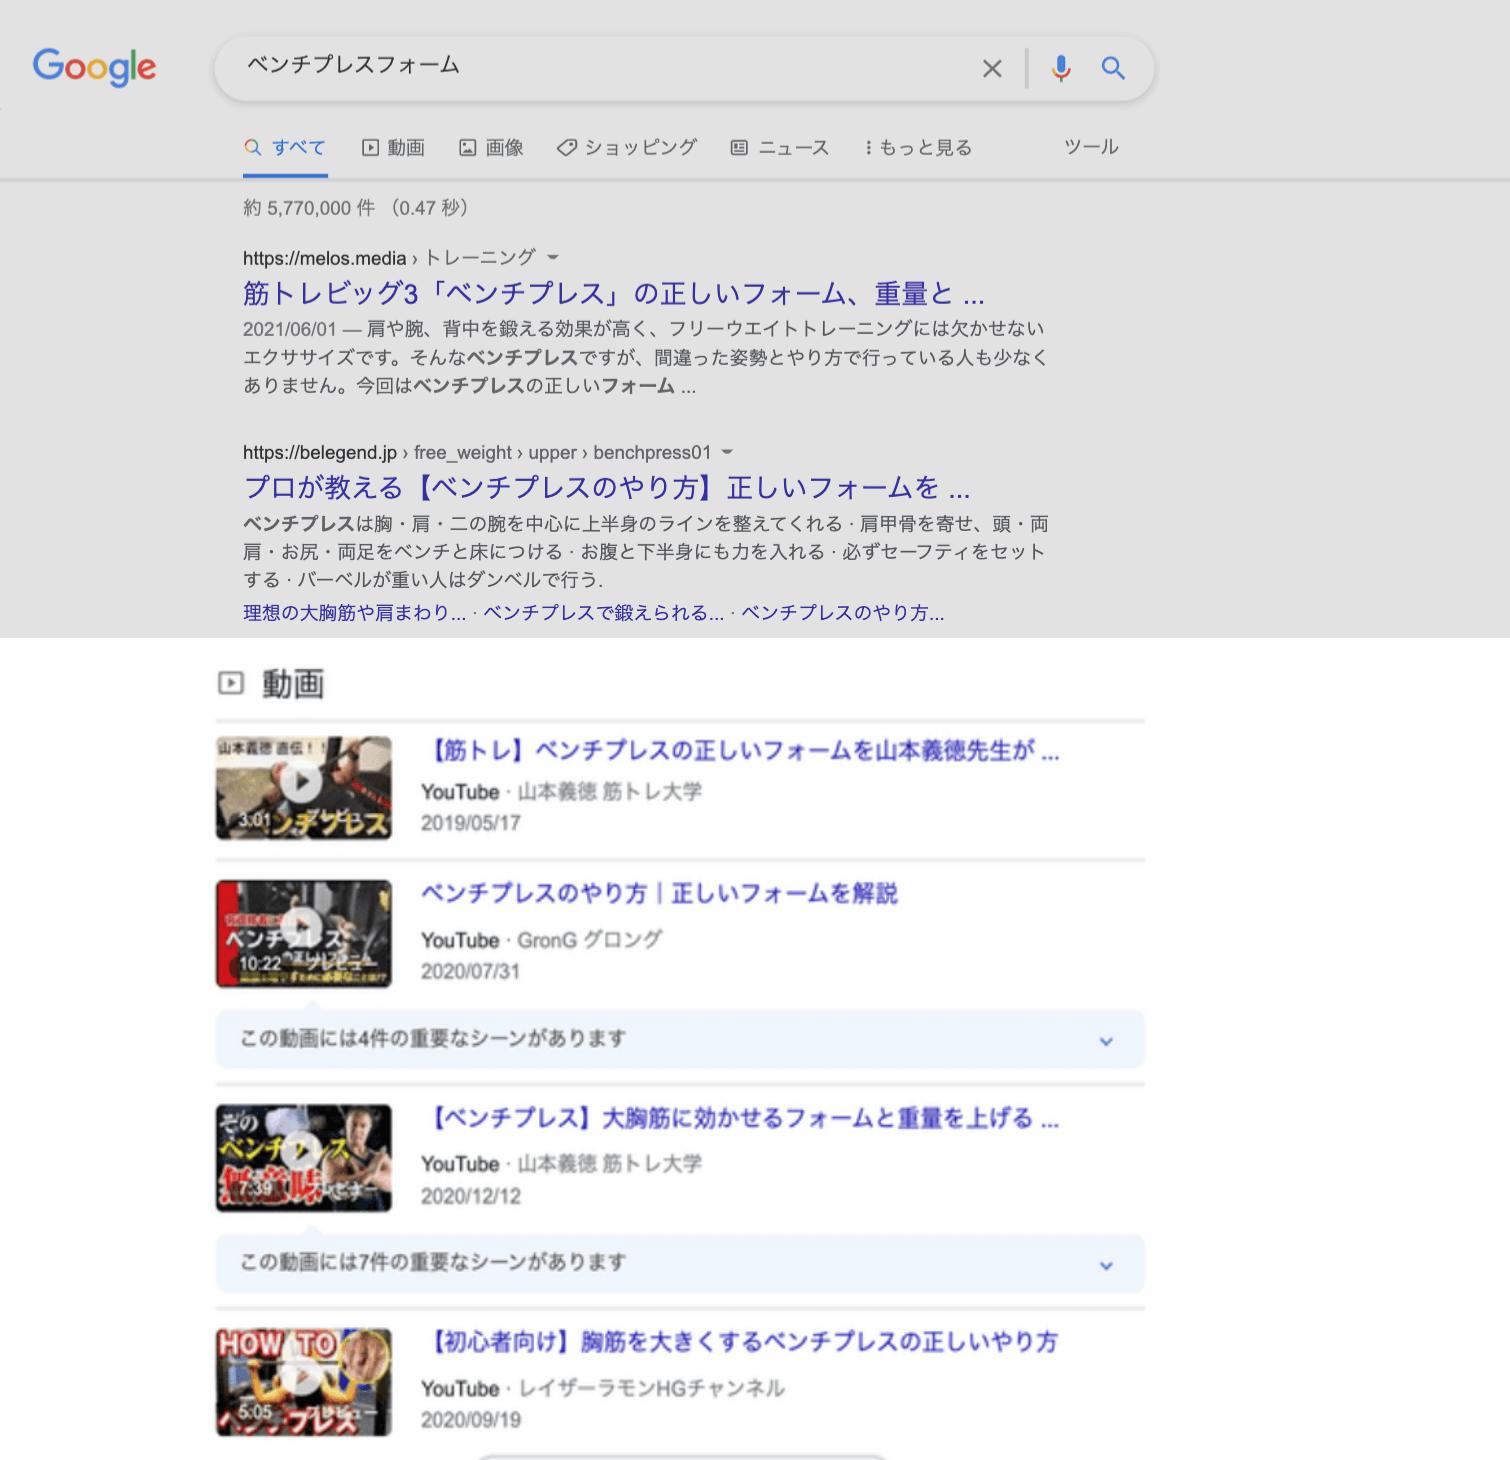 vseo-google search-top display